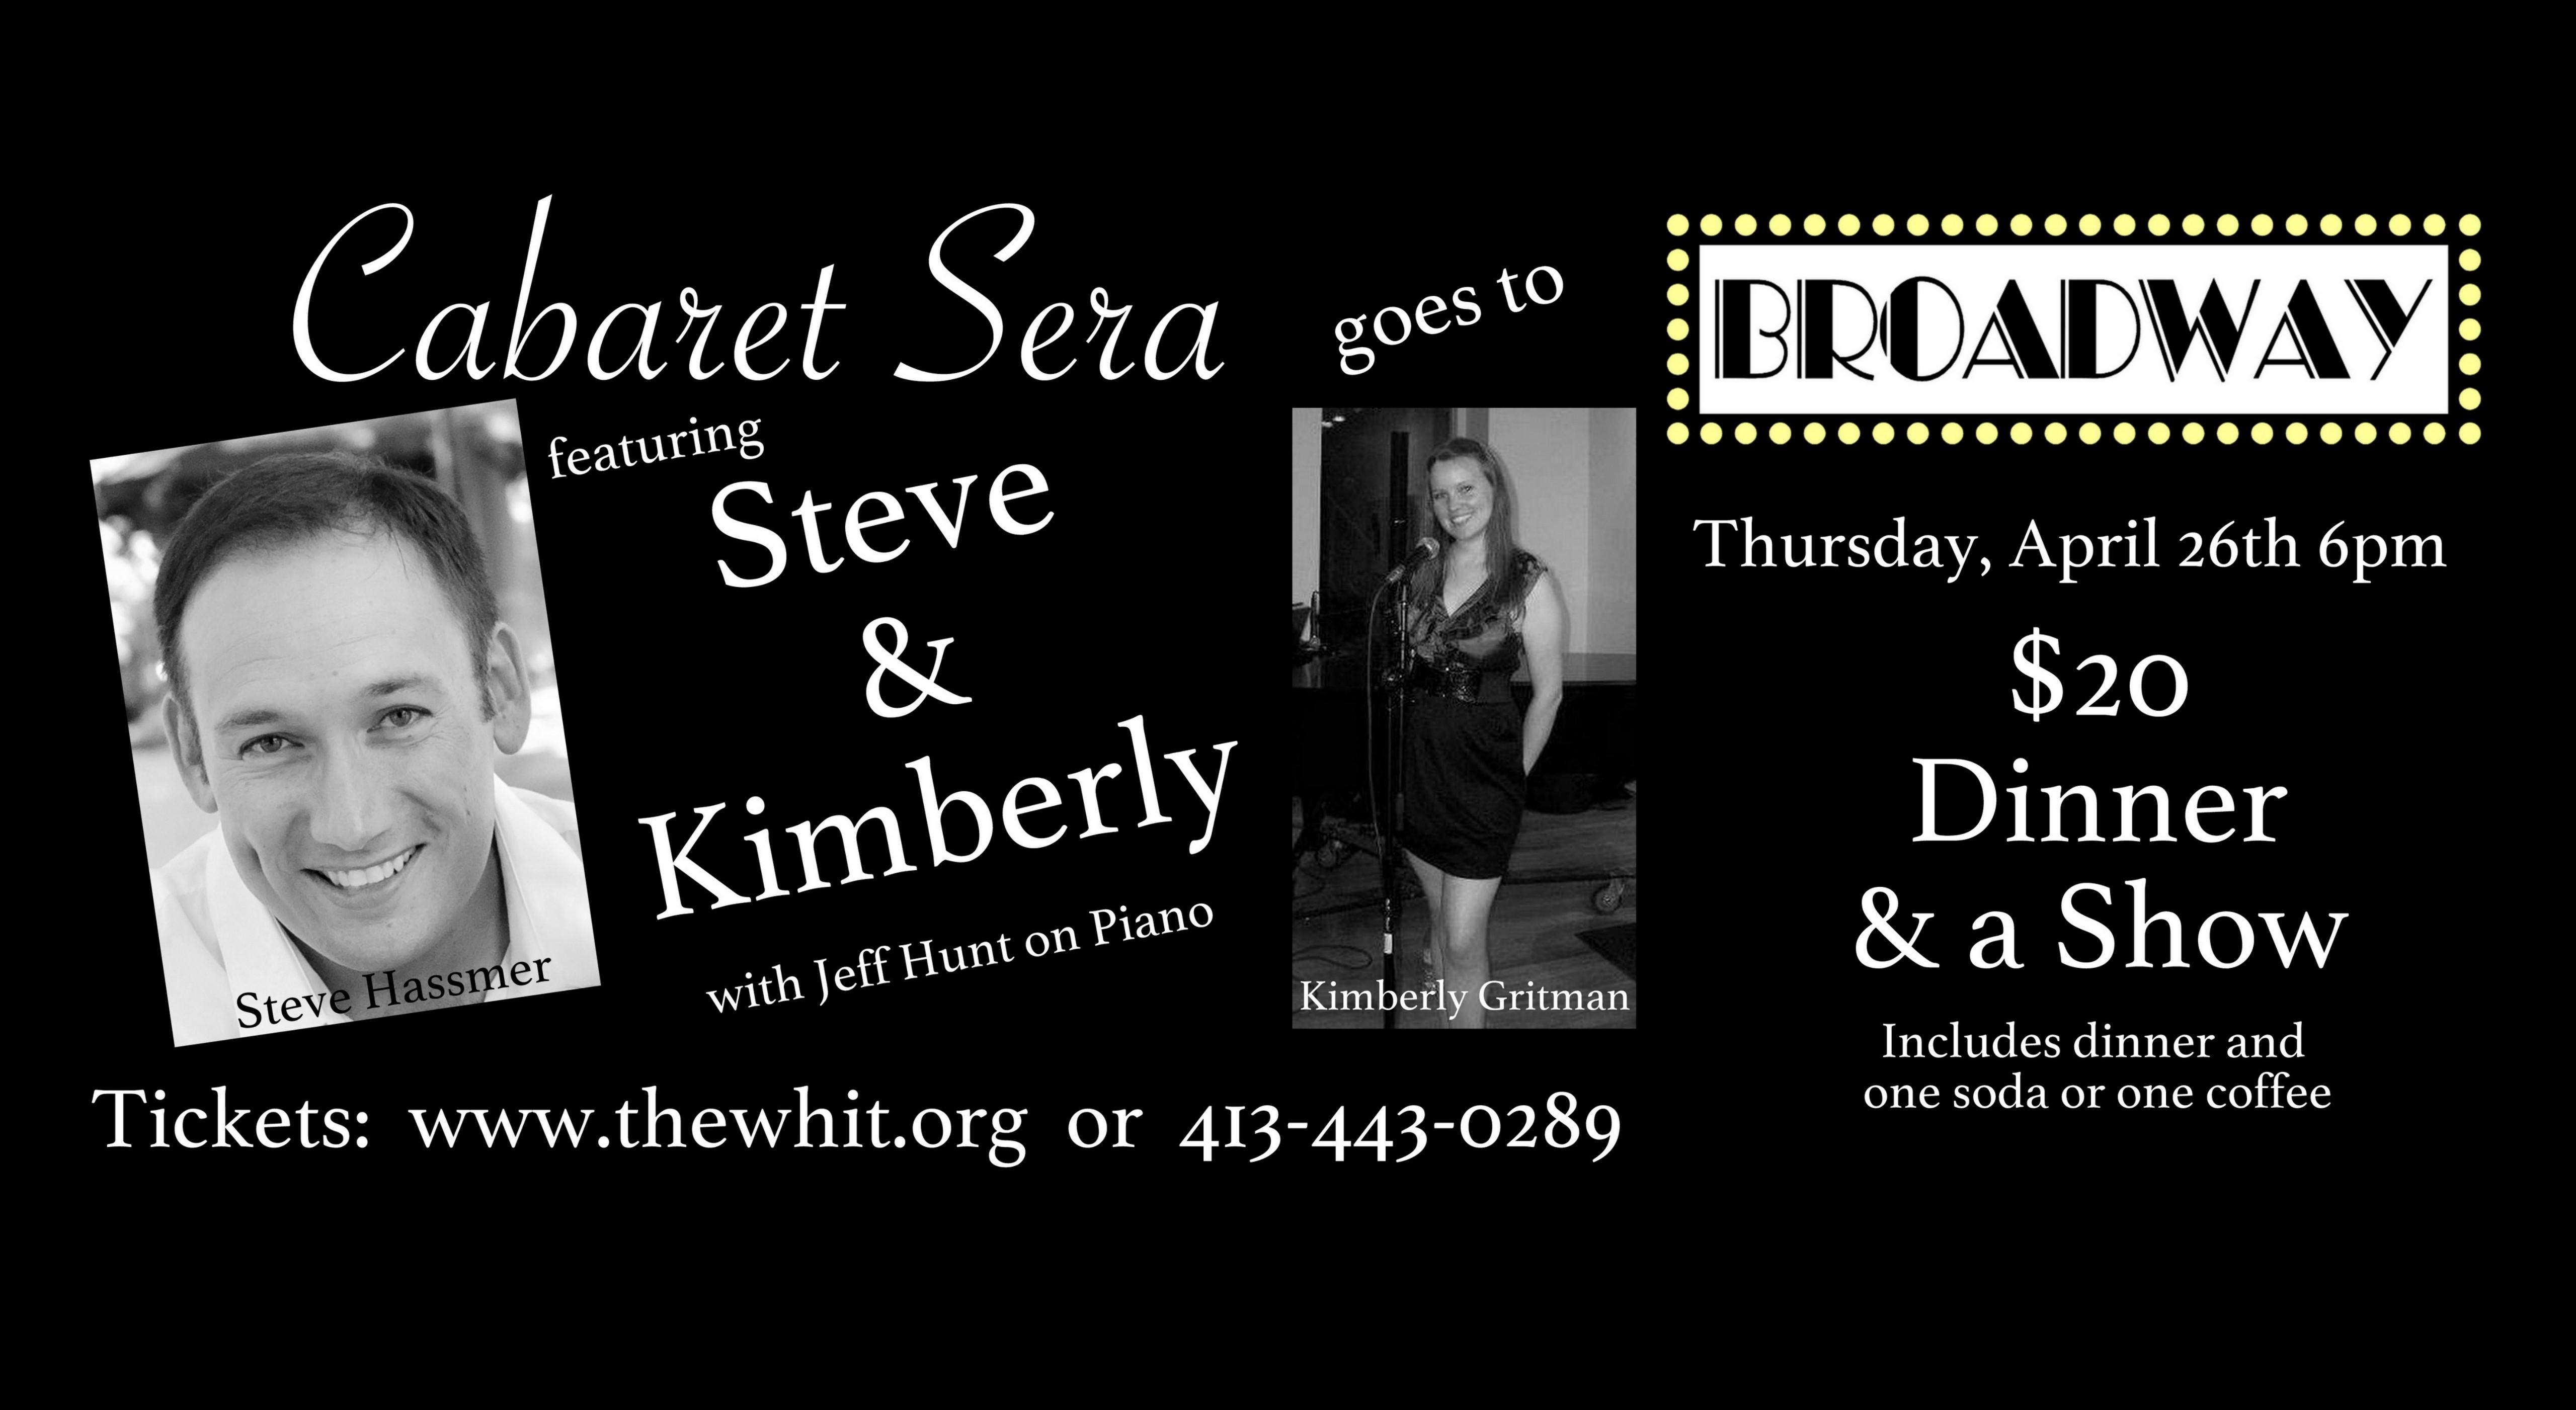 Cabaret Sera goes to Broadway with Steve & Ki